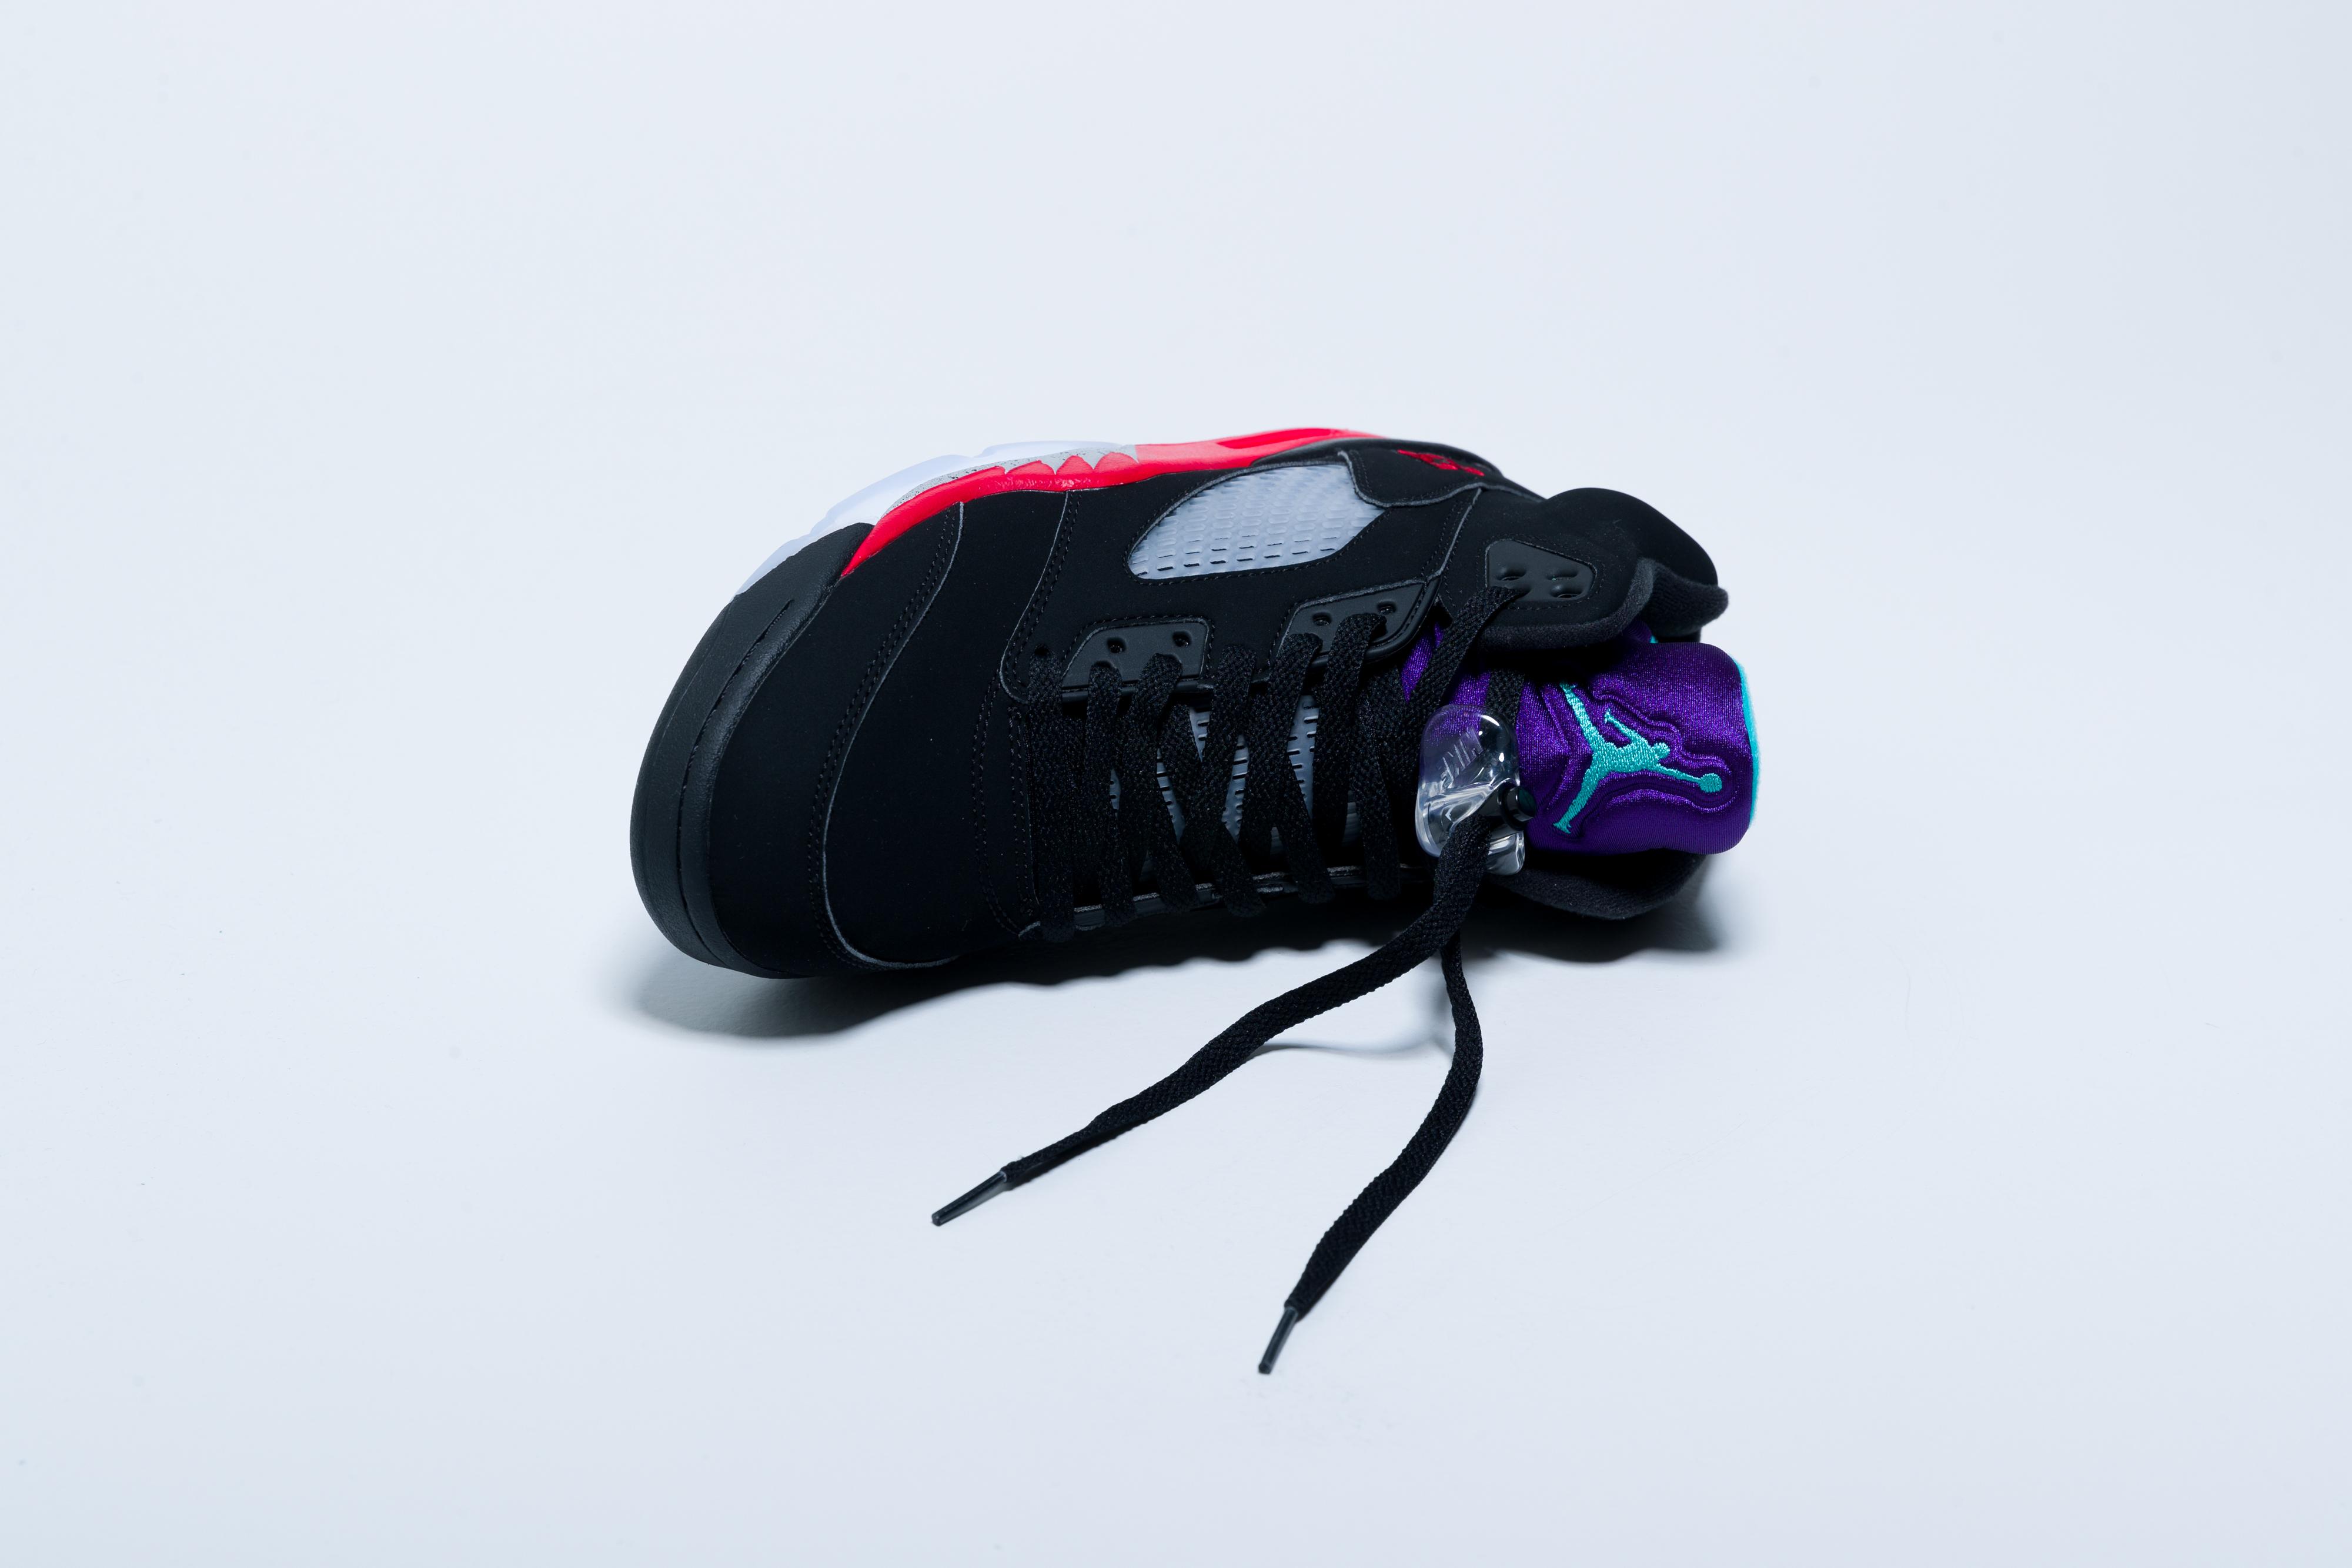 Nike Air Jordan 5 Retro - Black/Fire